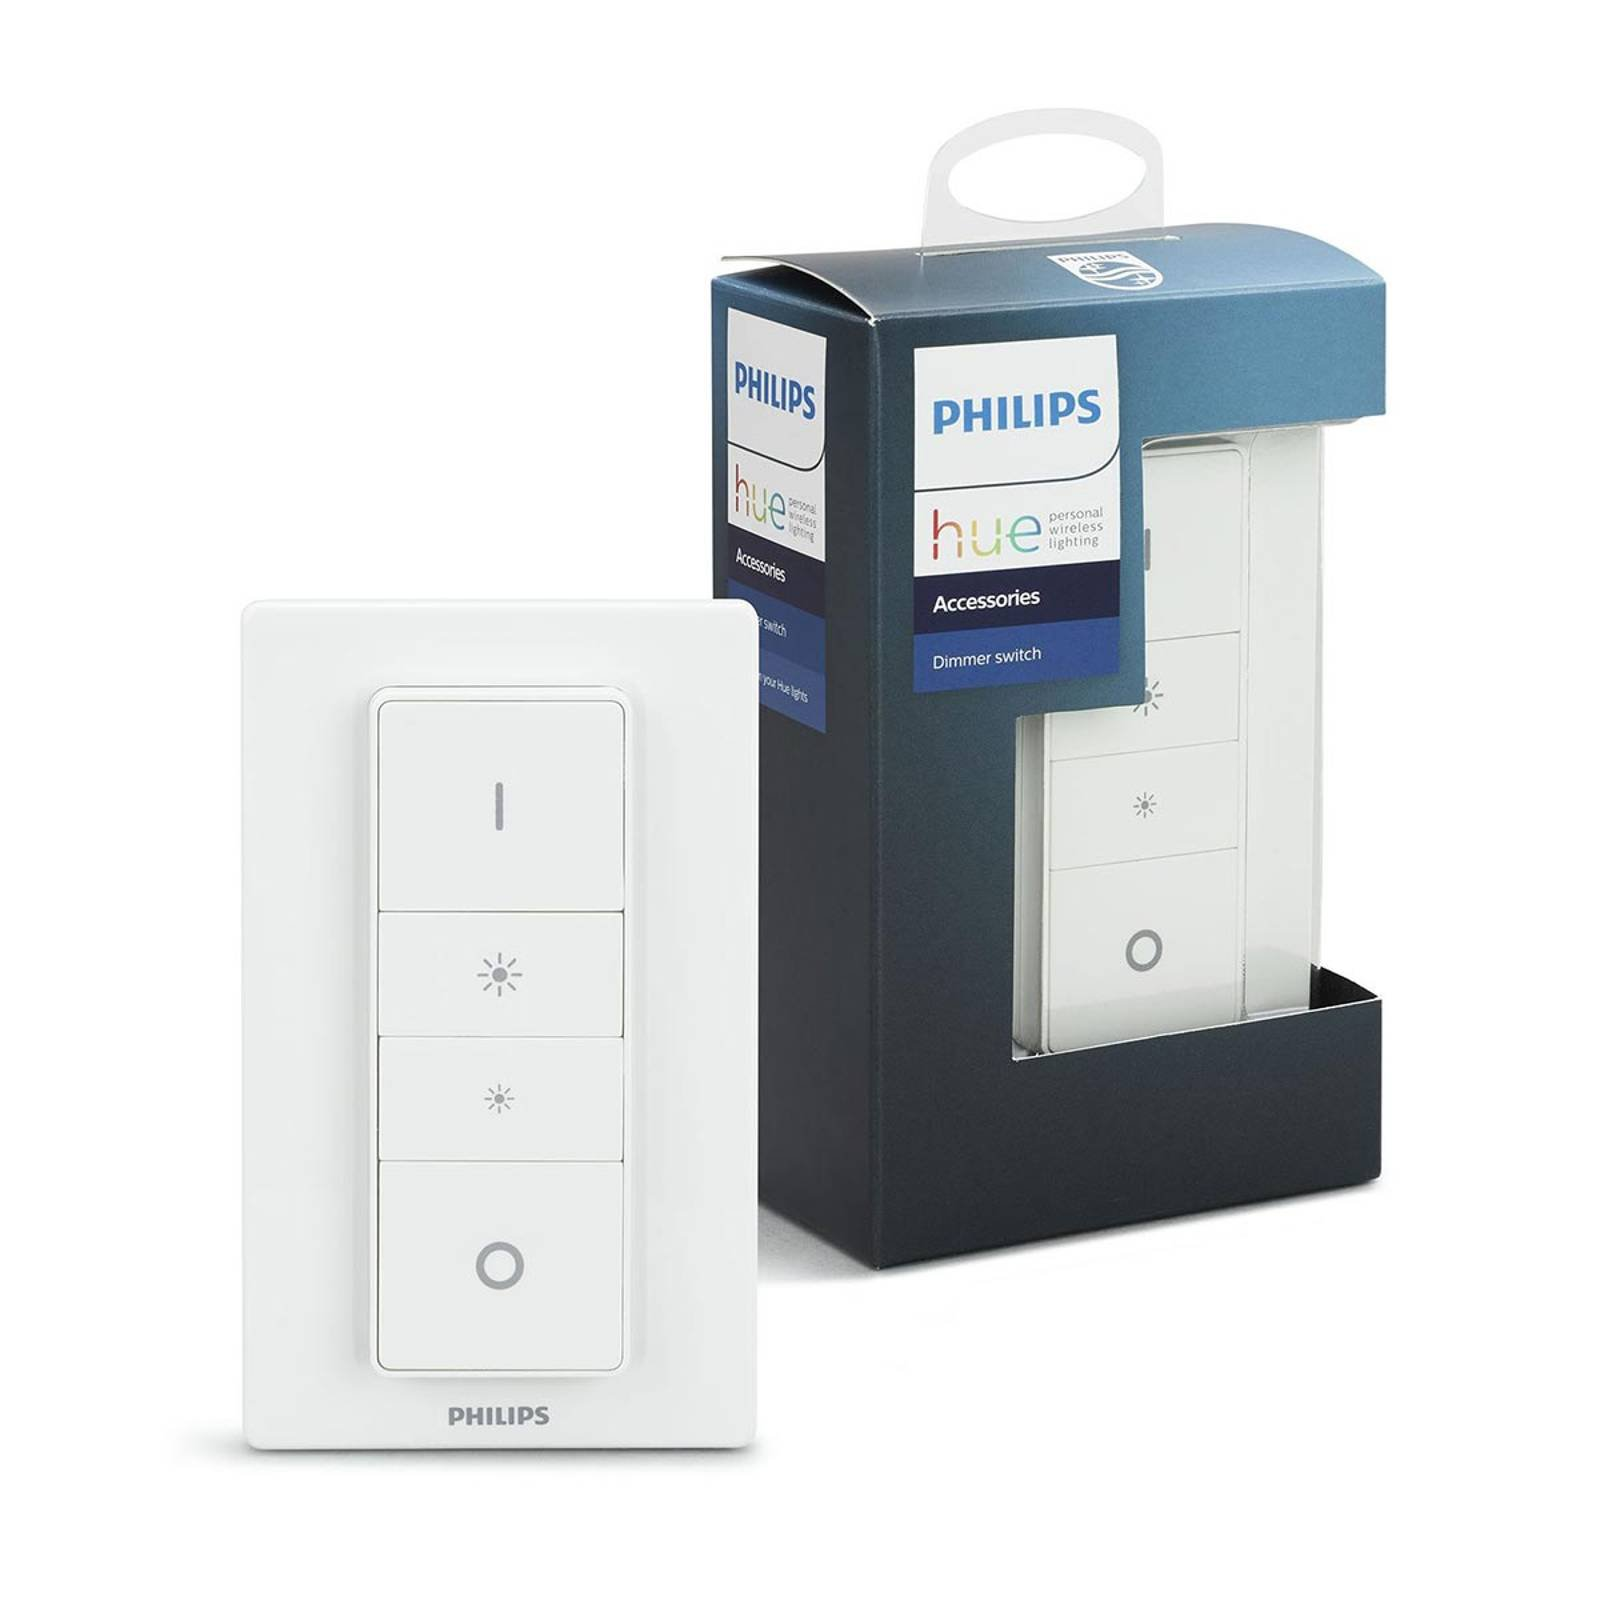 Philips Hue trådløs dimmebryter